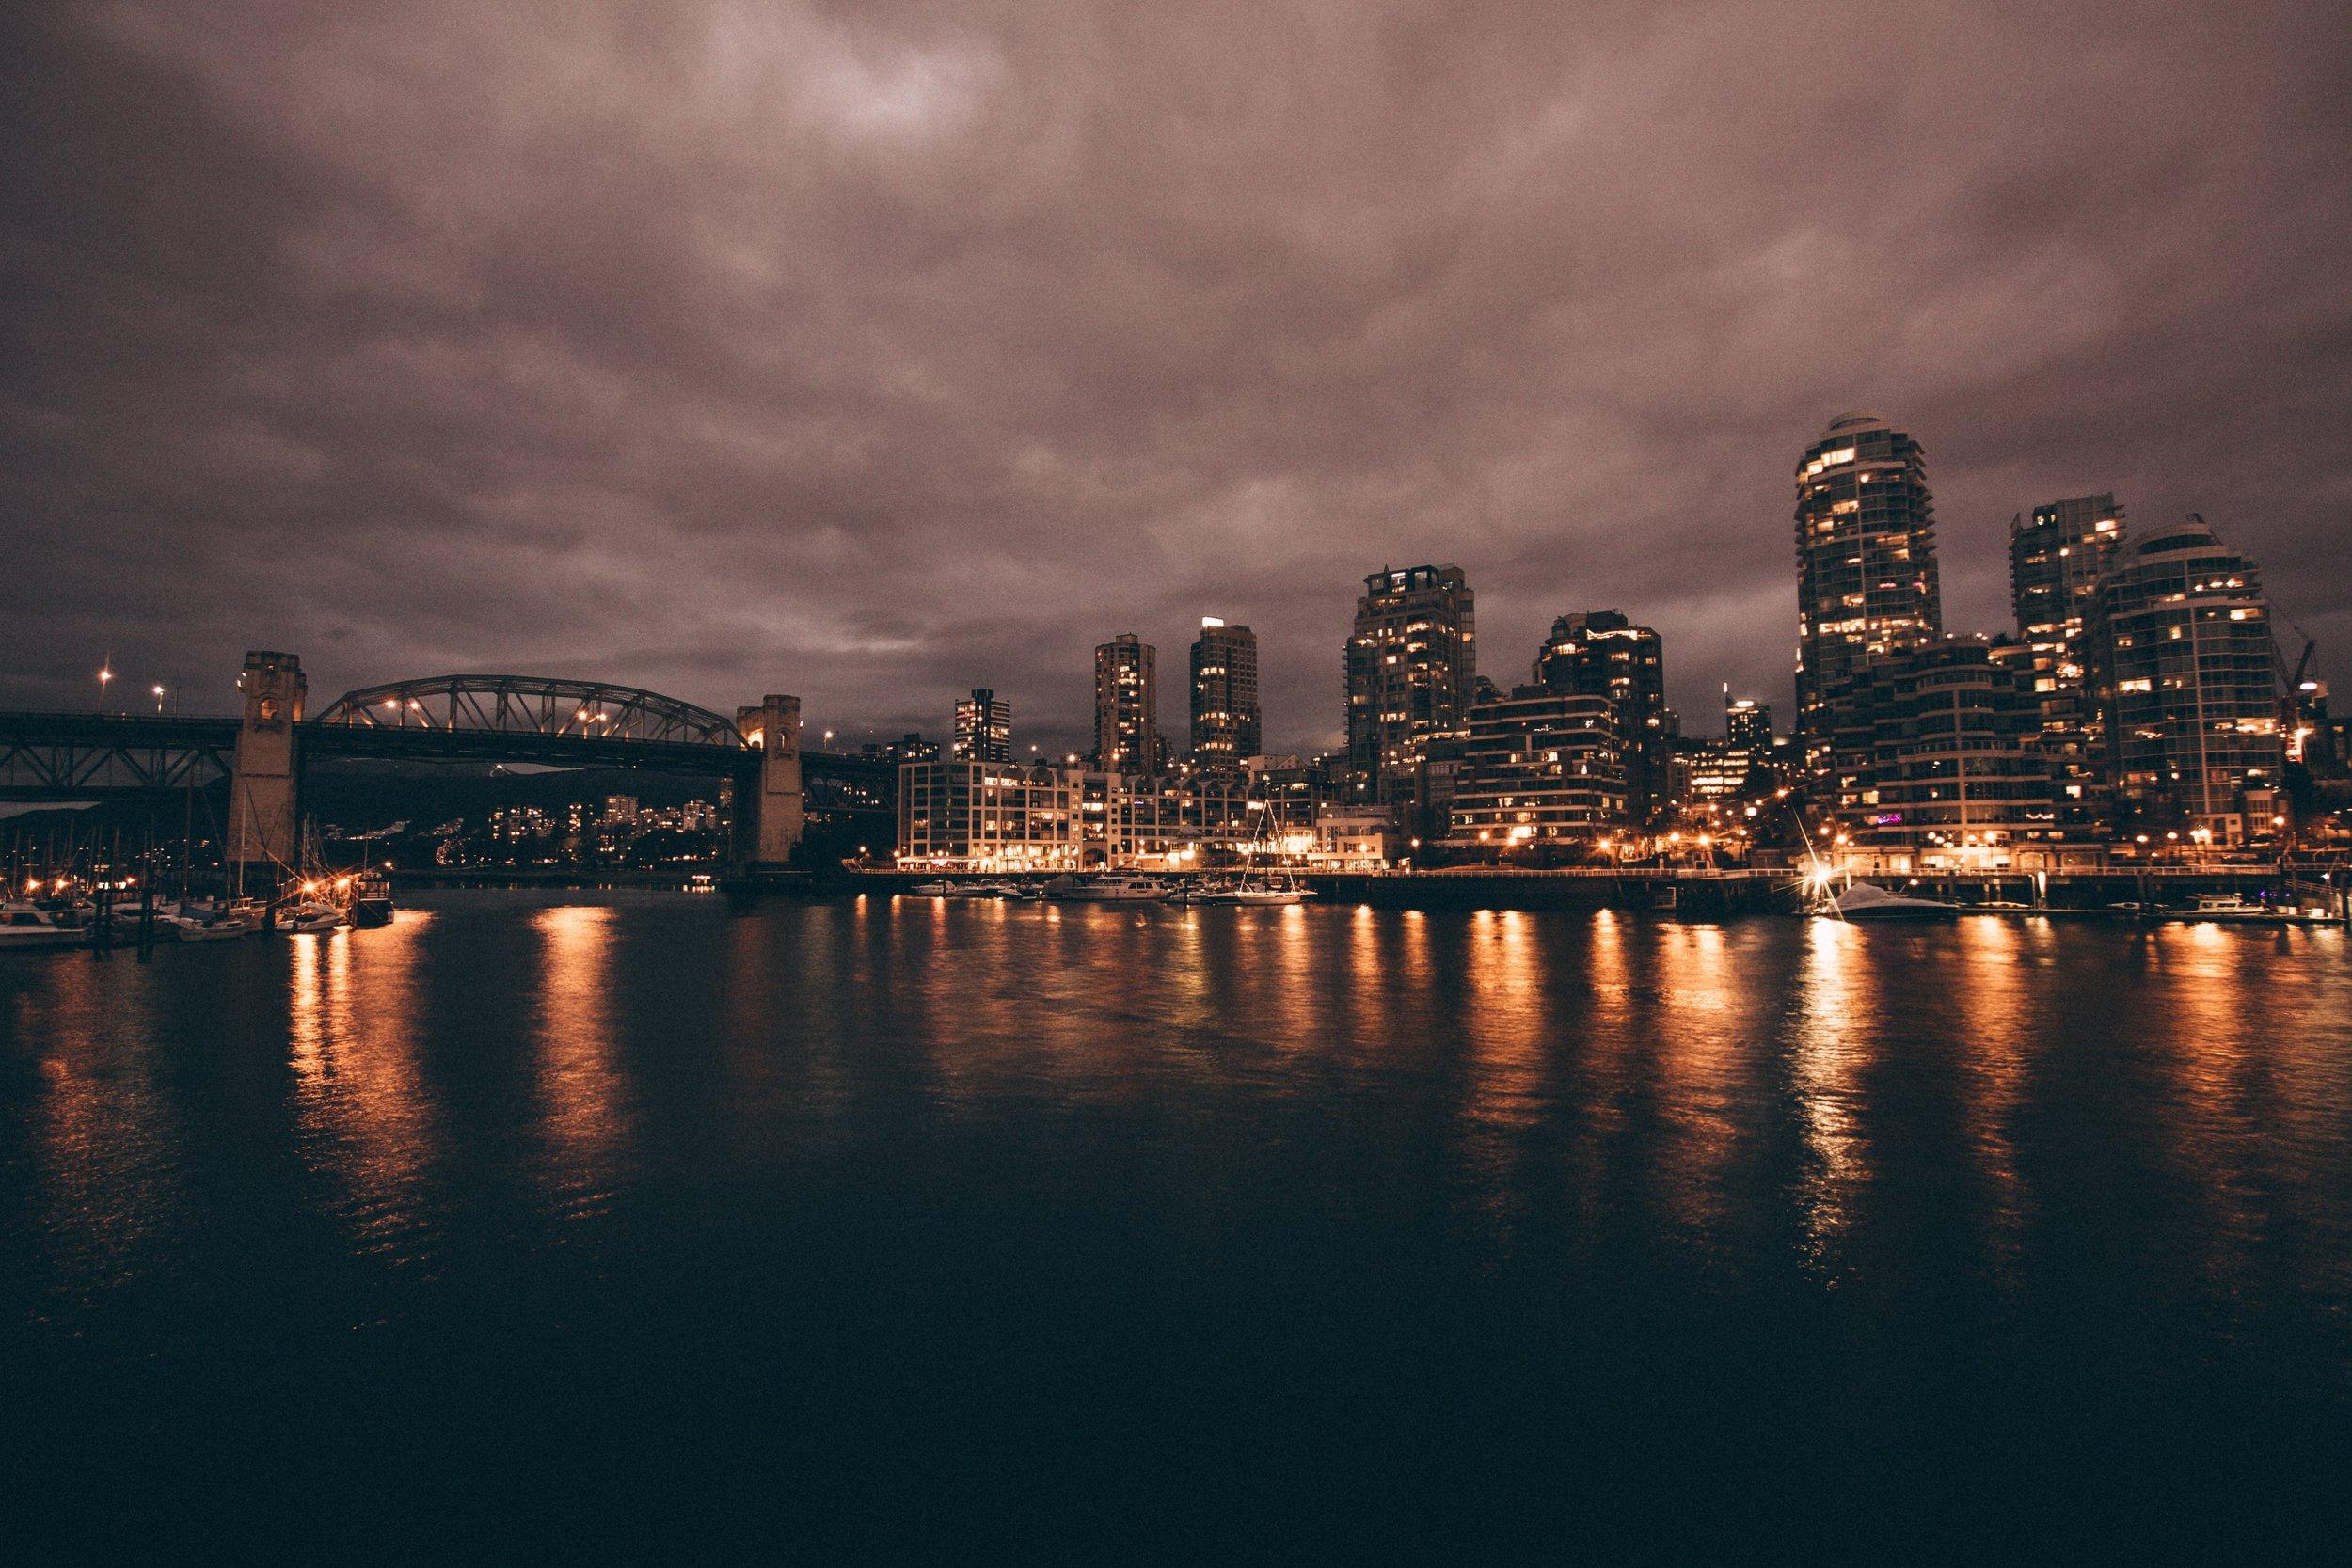 False Creek and Burrard Street Bridge, Vancouver